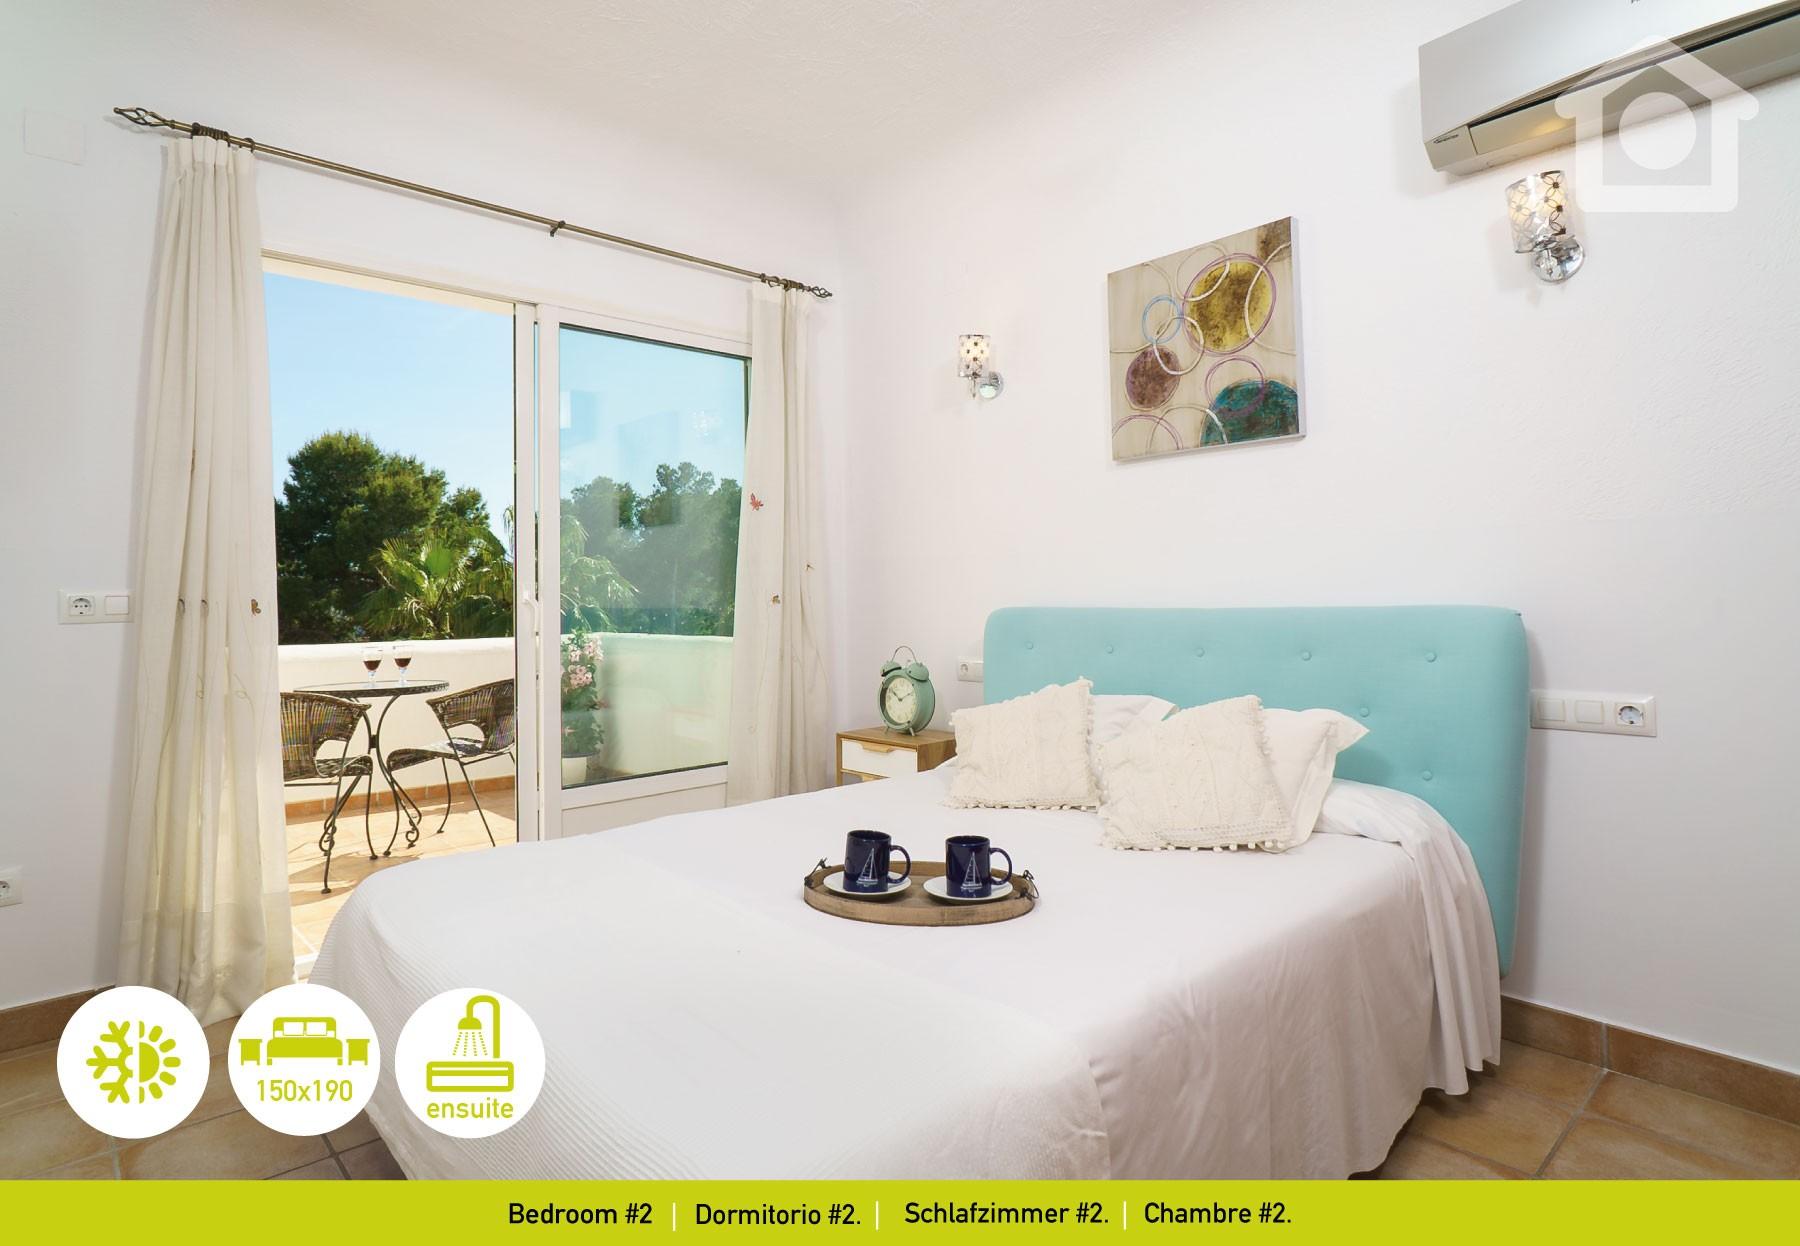 villas in moraira - solhabitat moraira portet relax, Schlafzimmer entwurf